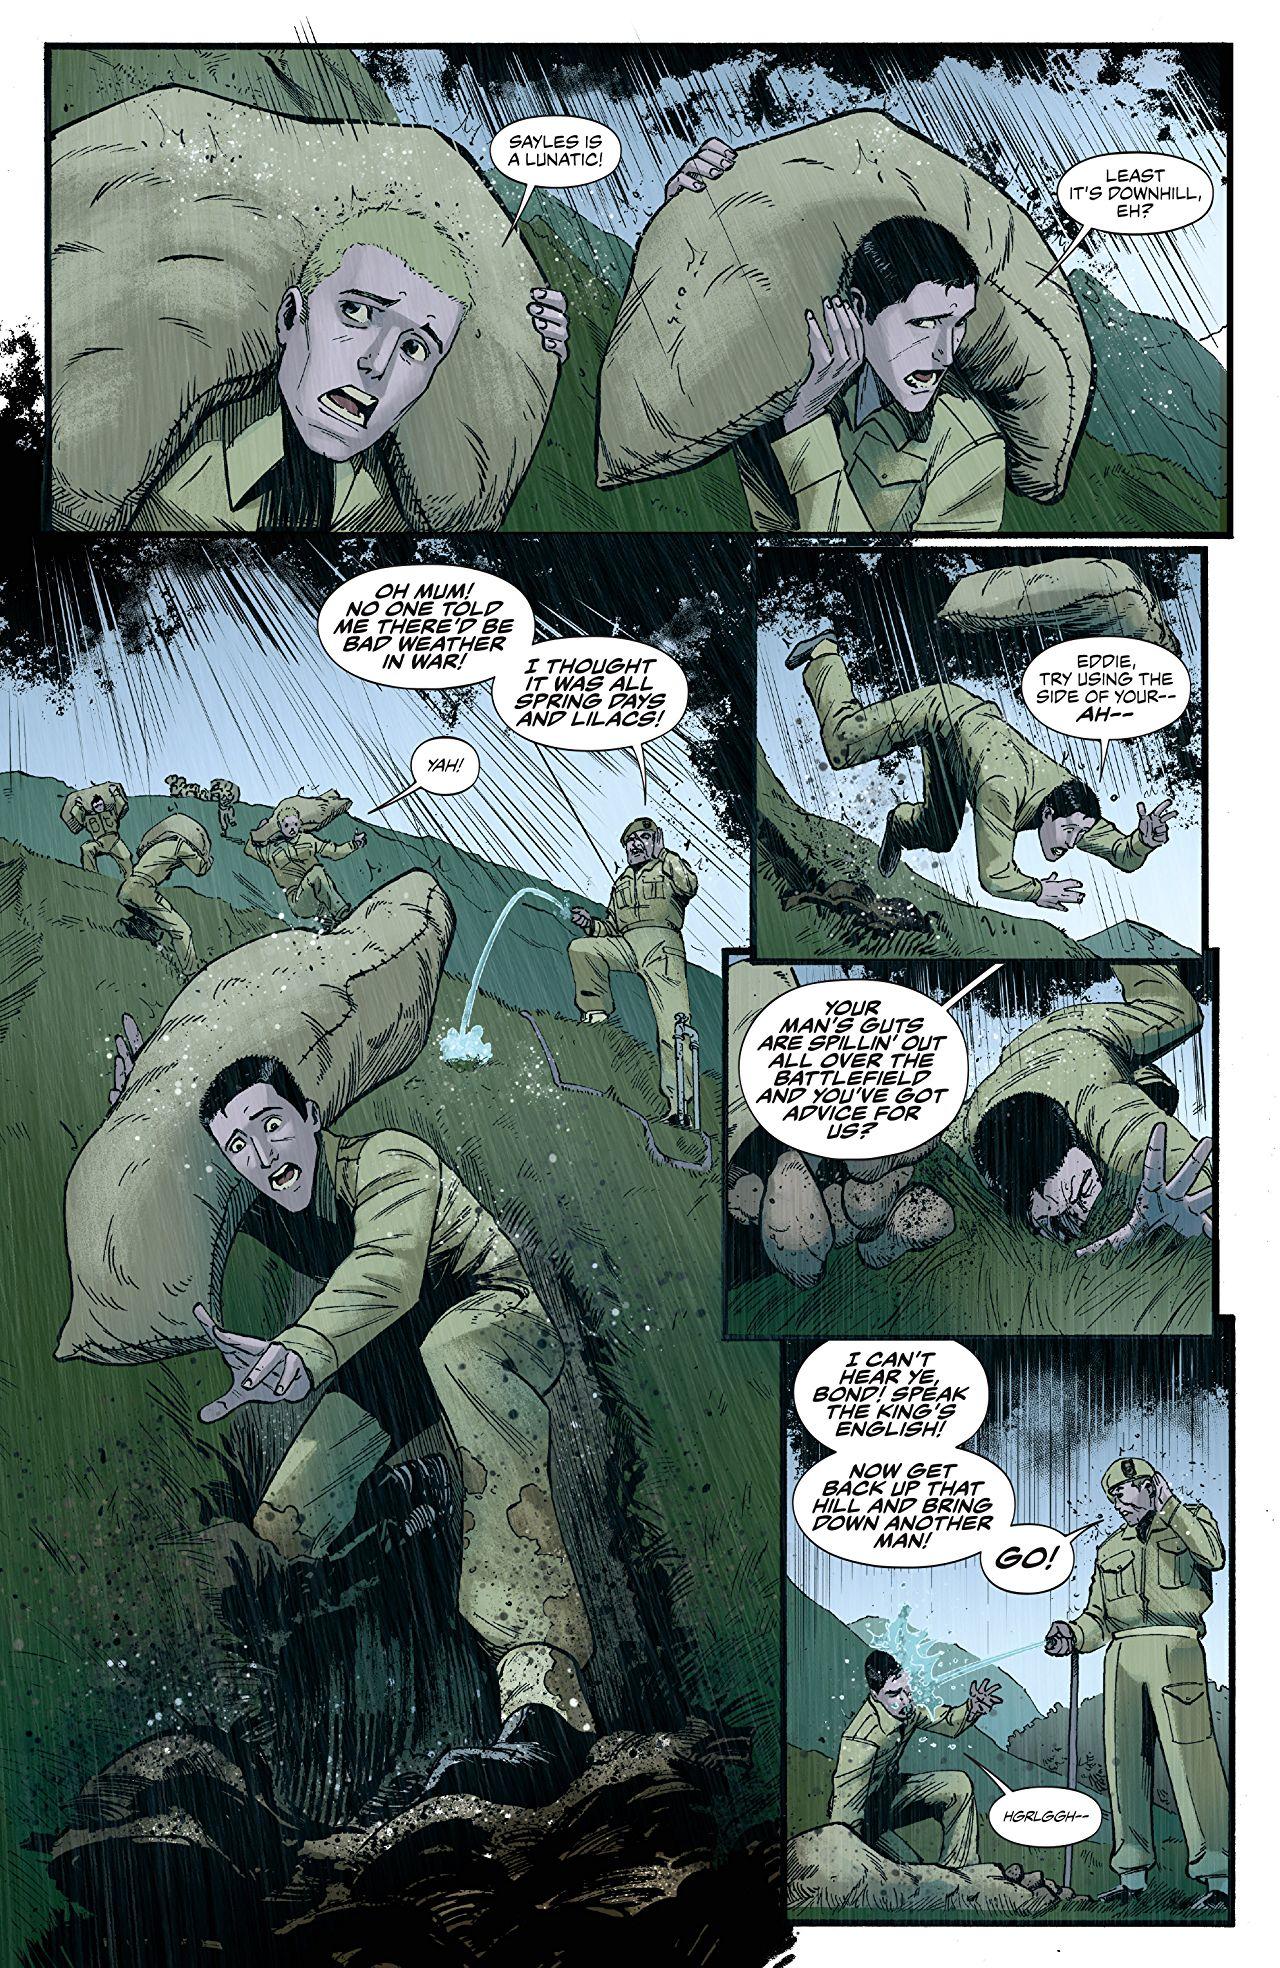 James Bond Origin Overview Of A Notable Spy Thriller Comics 4